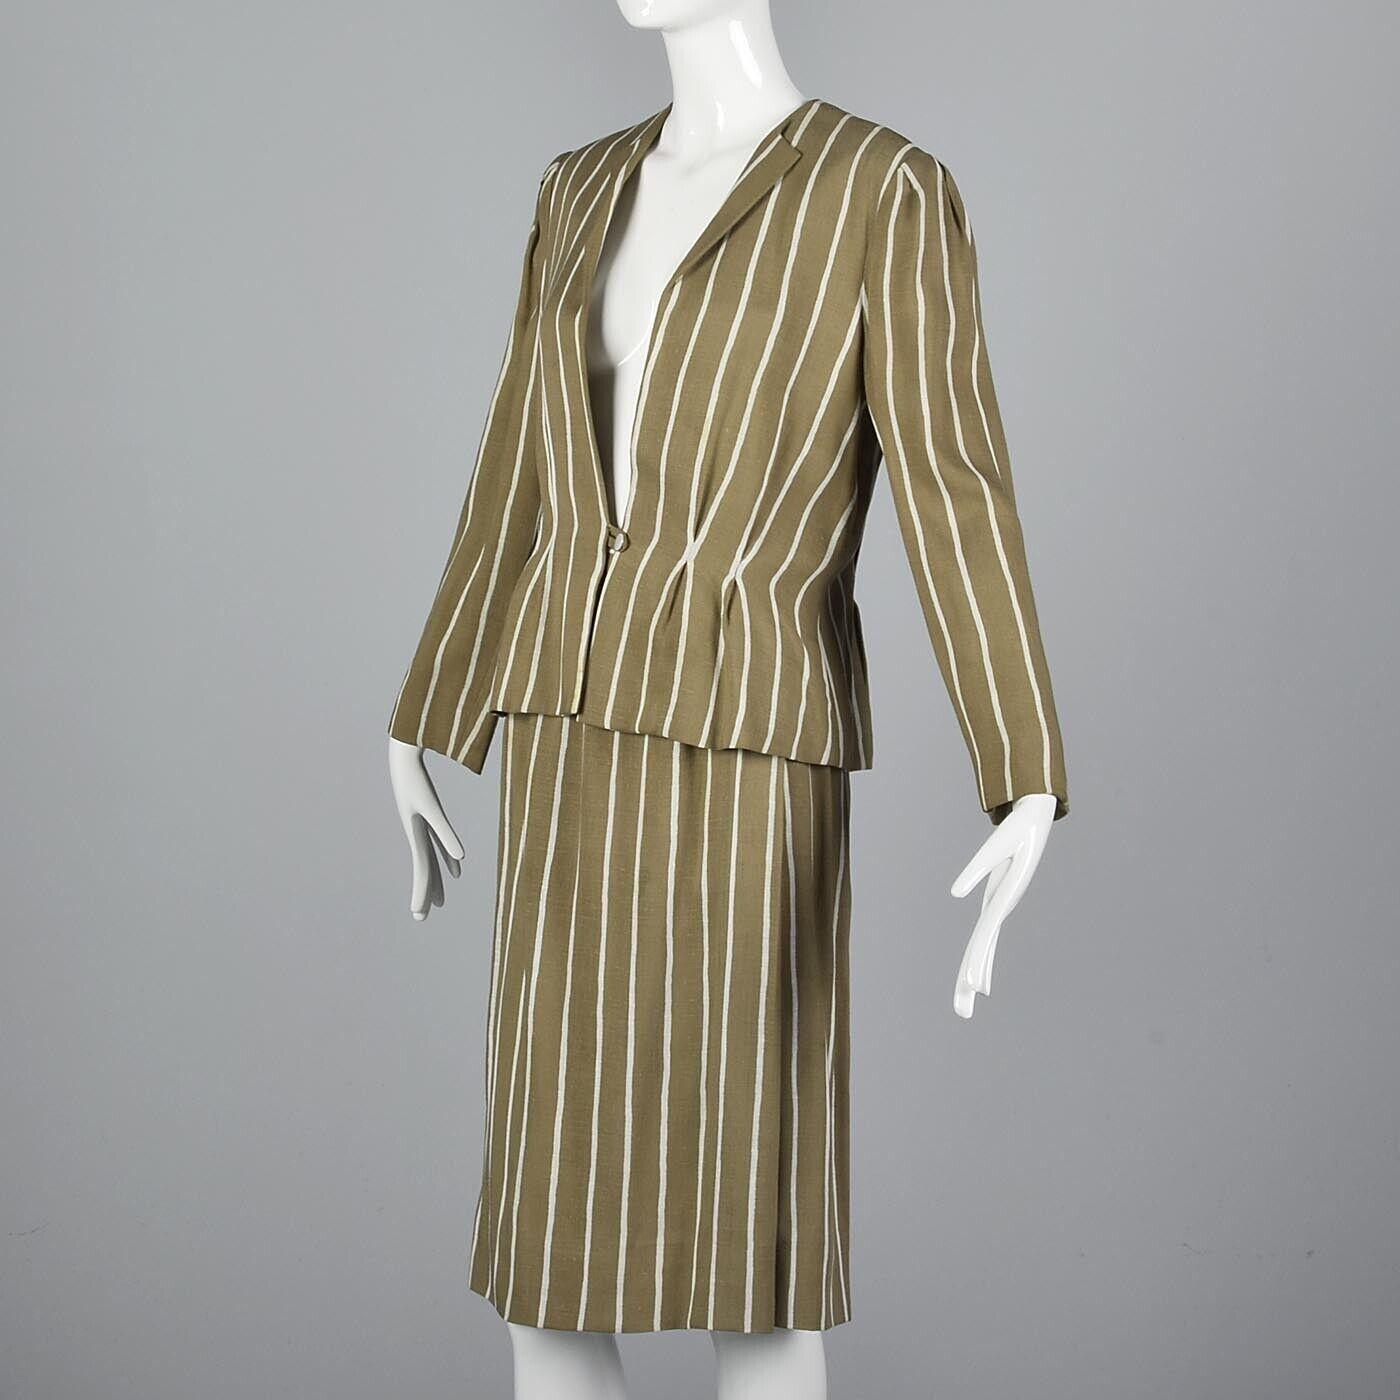 L Vintage 1980s 80s Pauline Trigere Striped Skirt… - image 2